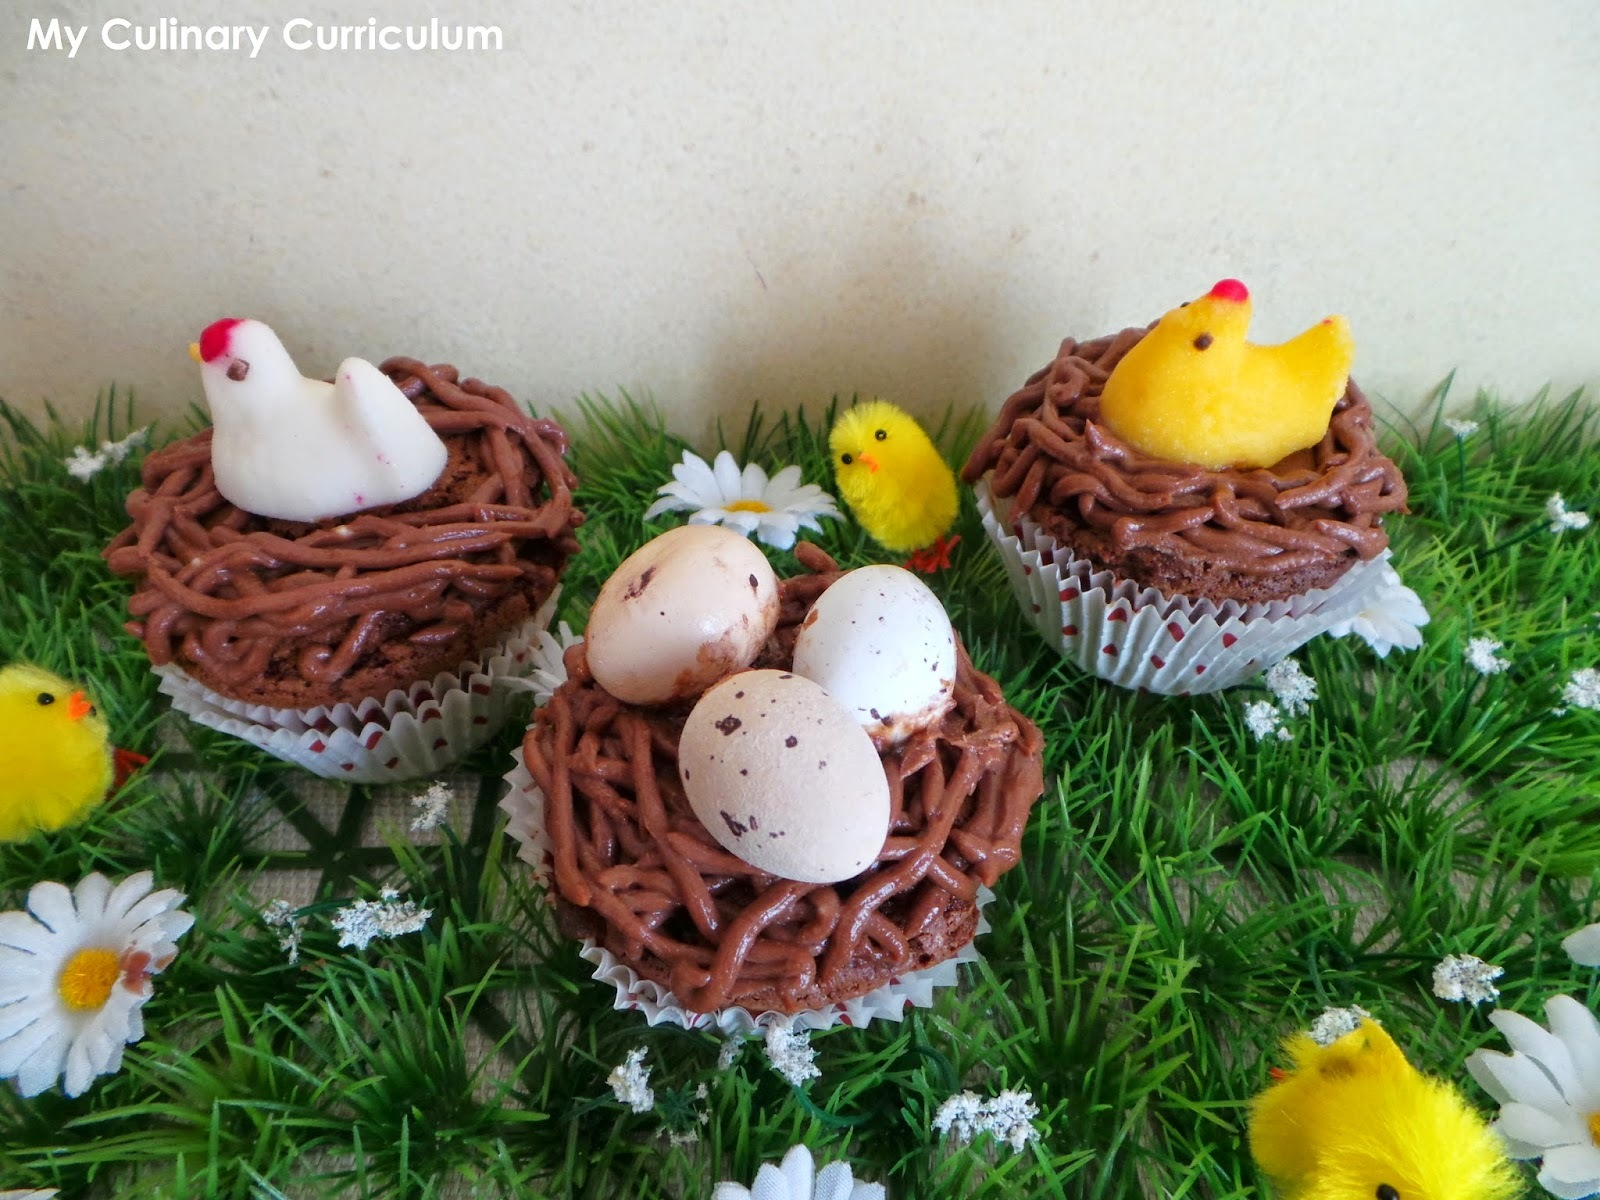 Cupcakes nids de Pâques au chocolat (recette facile)  (Chocolate Easter cupcakes )